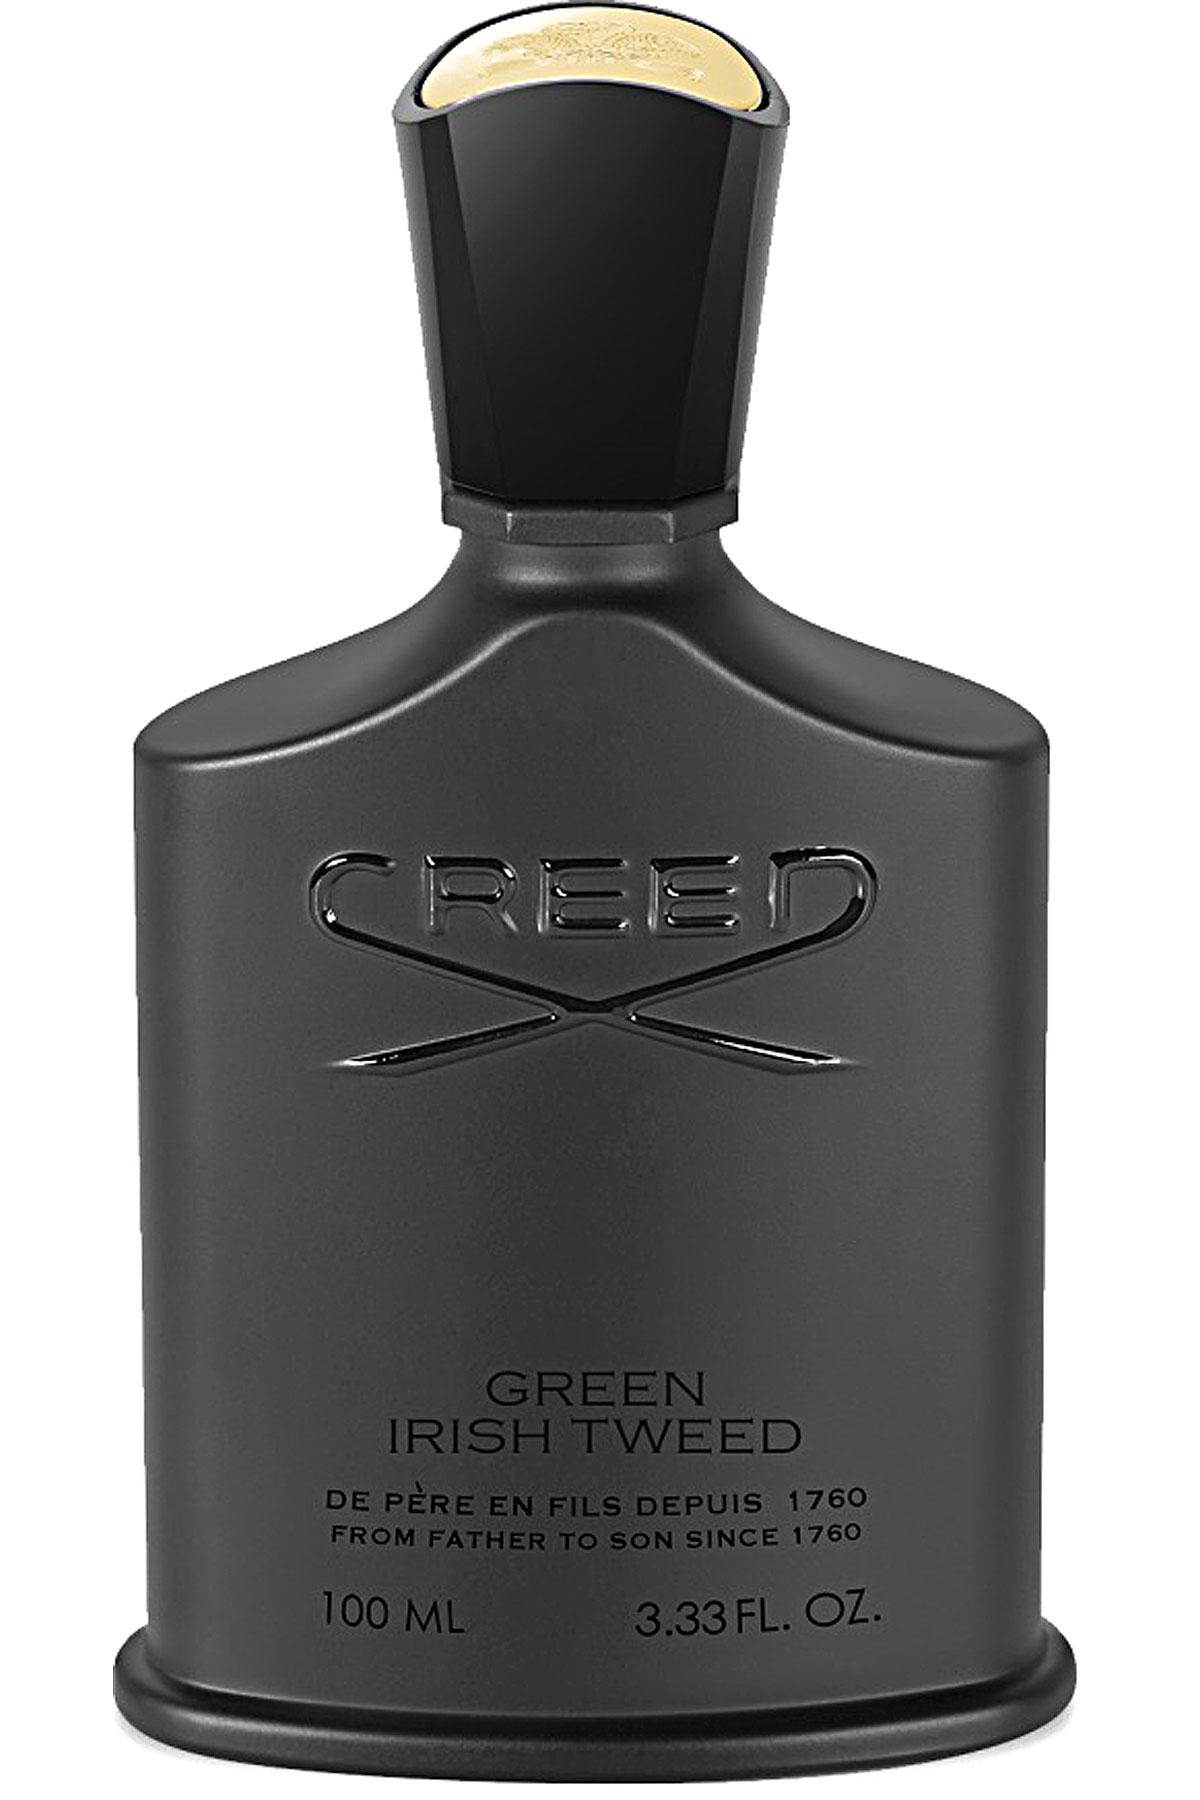 Creed Fragrances for Men, Green Irish Tweed - Eau De Parfum- 100 Ml, 2019, 100 ml